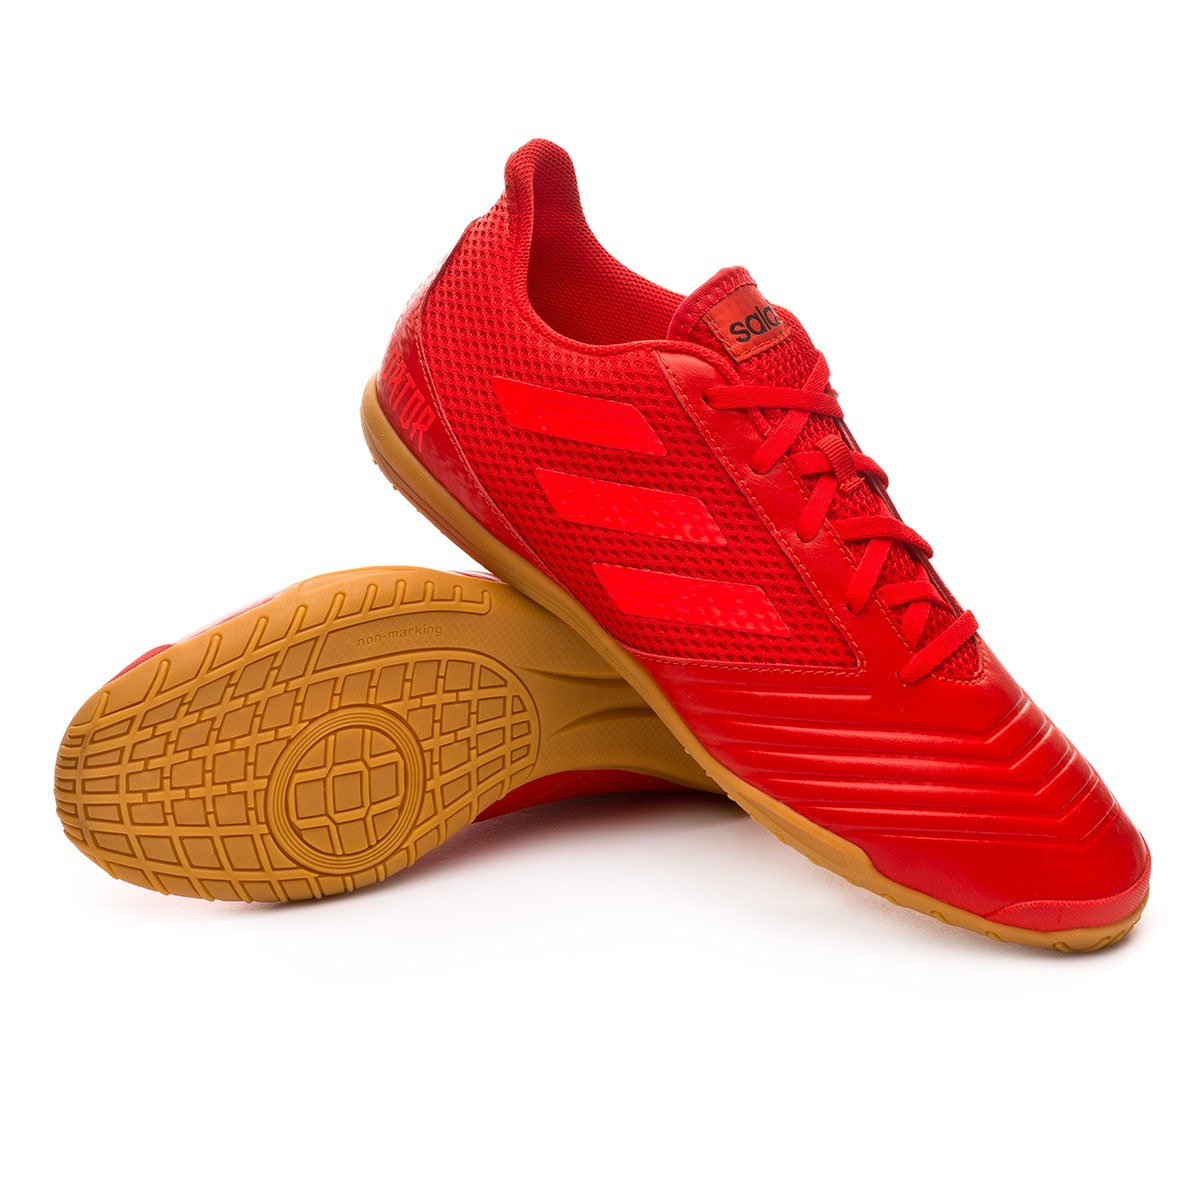 Chaussure de futsal adidas Predator Tango 19.4 IN Sala